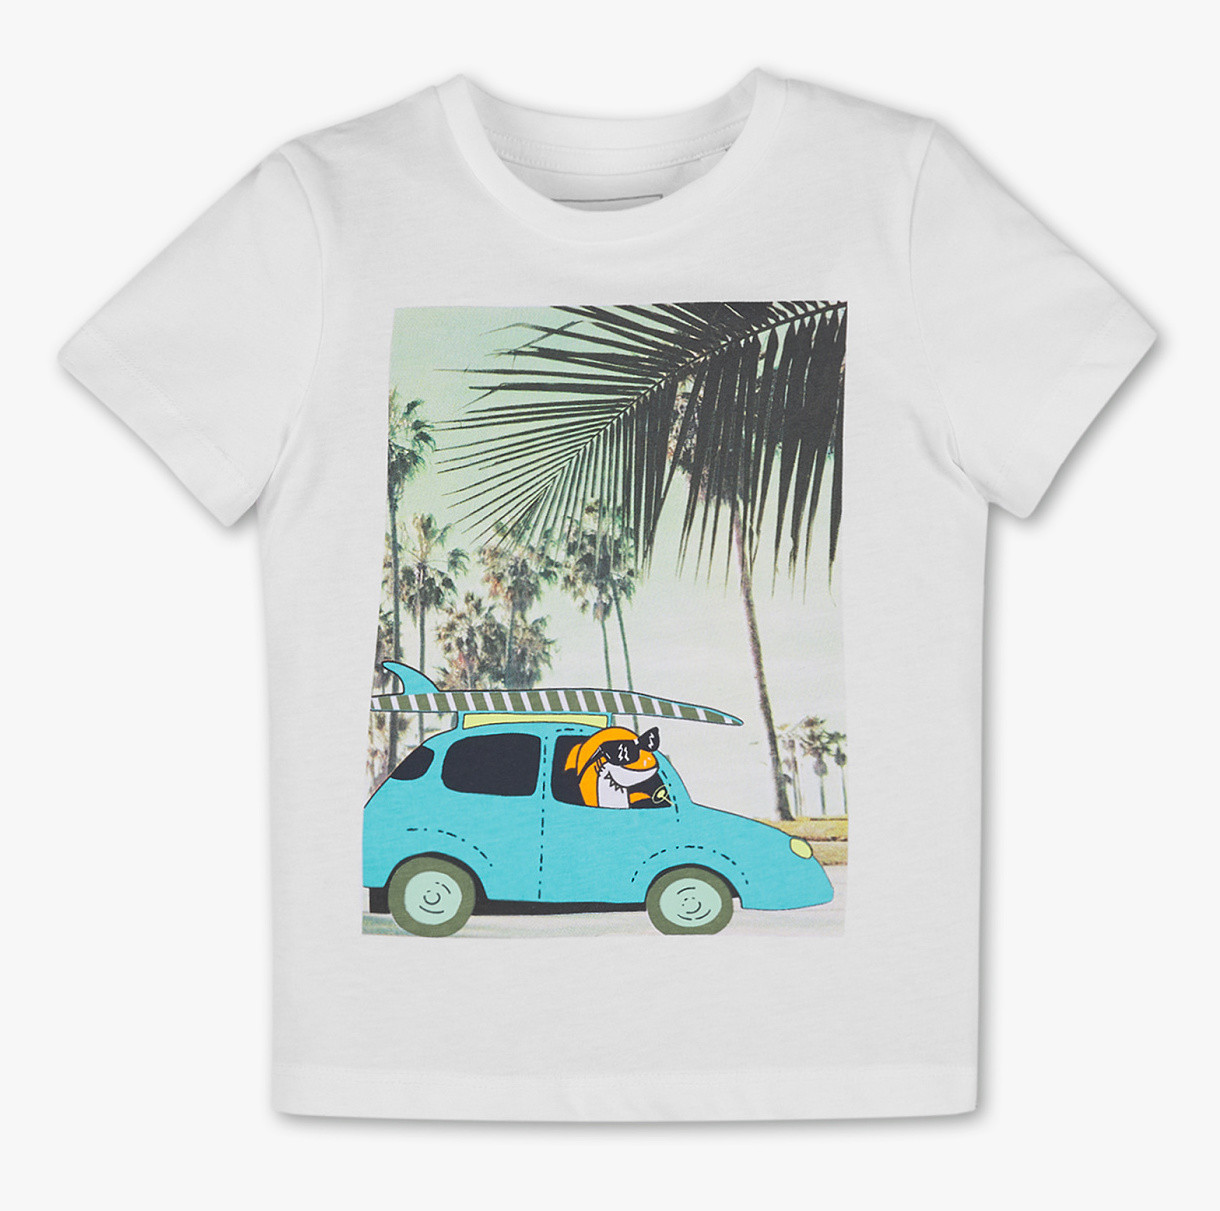 Белая футболка с акулой на мальчика 5-6 лет C&A Германия Размер 116